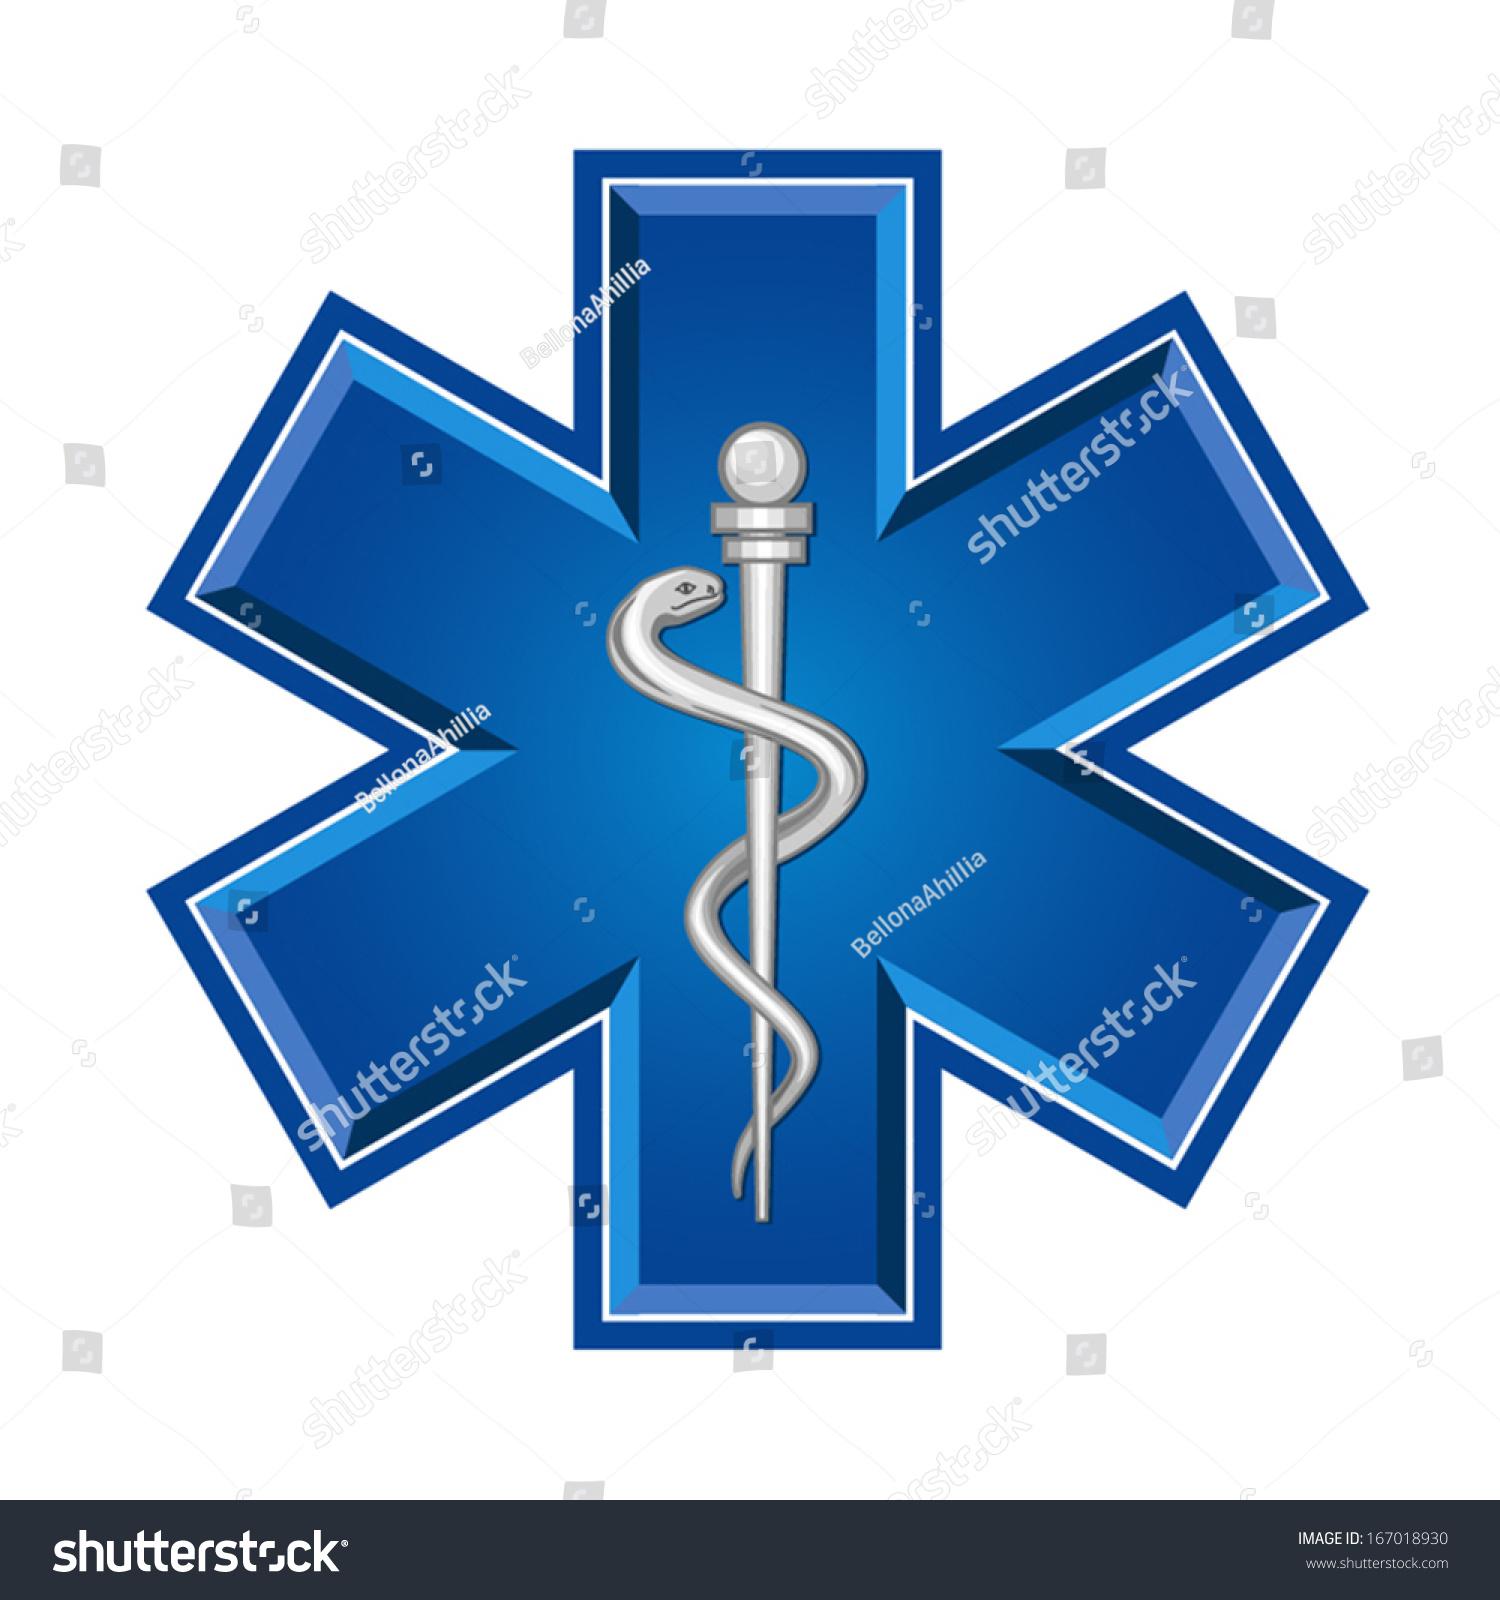 Emergency Star Medical Symbol Caduceus Snake With Stick Ez Canvas